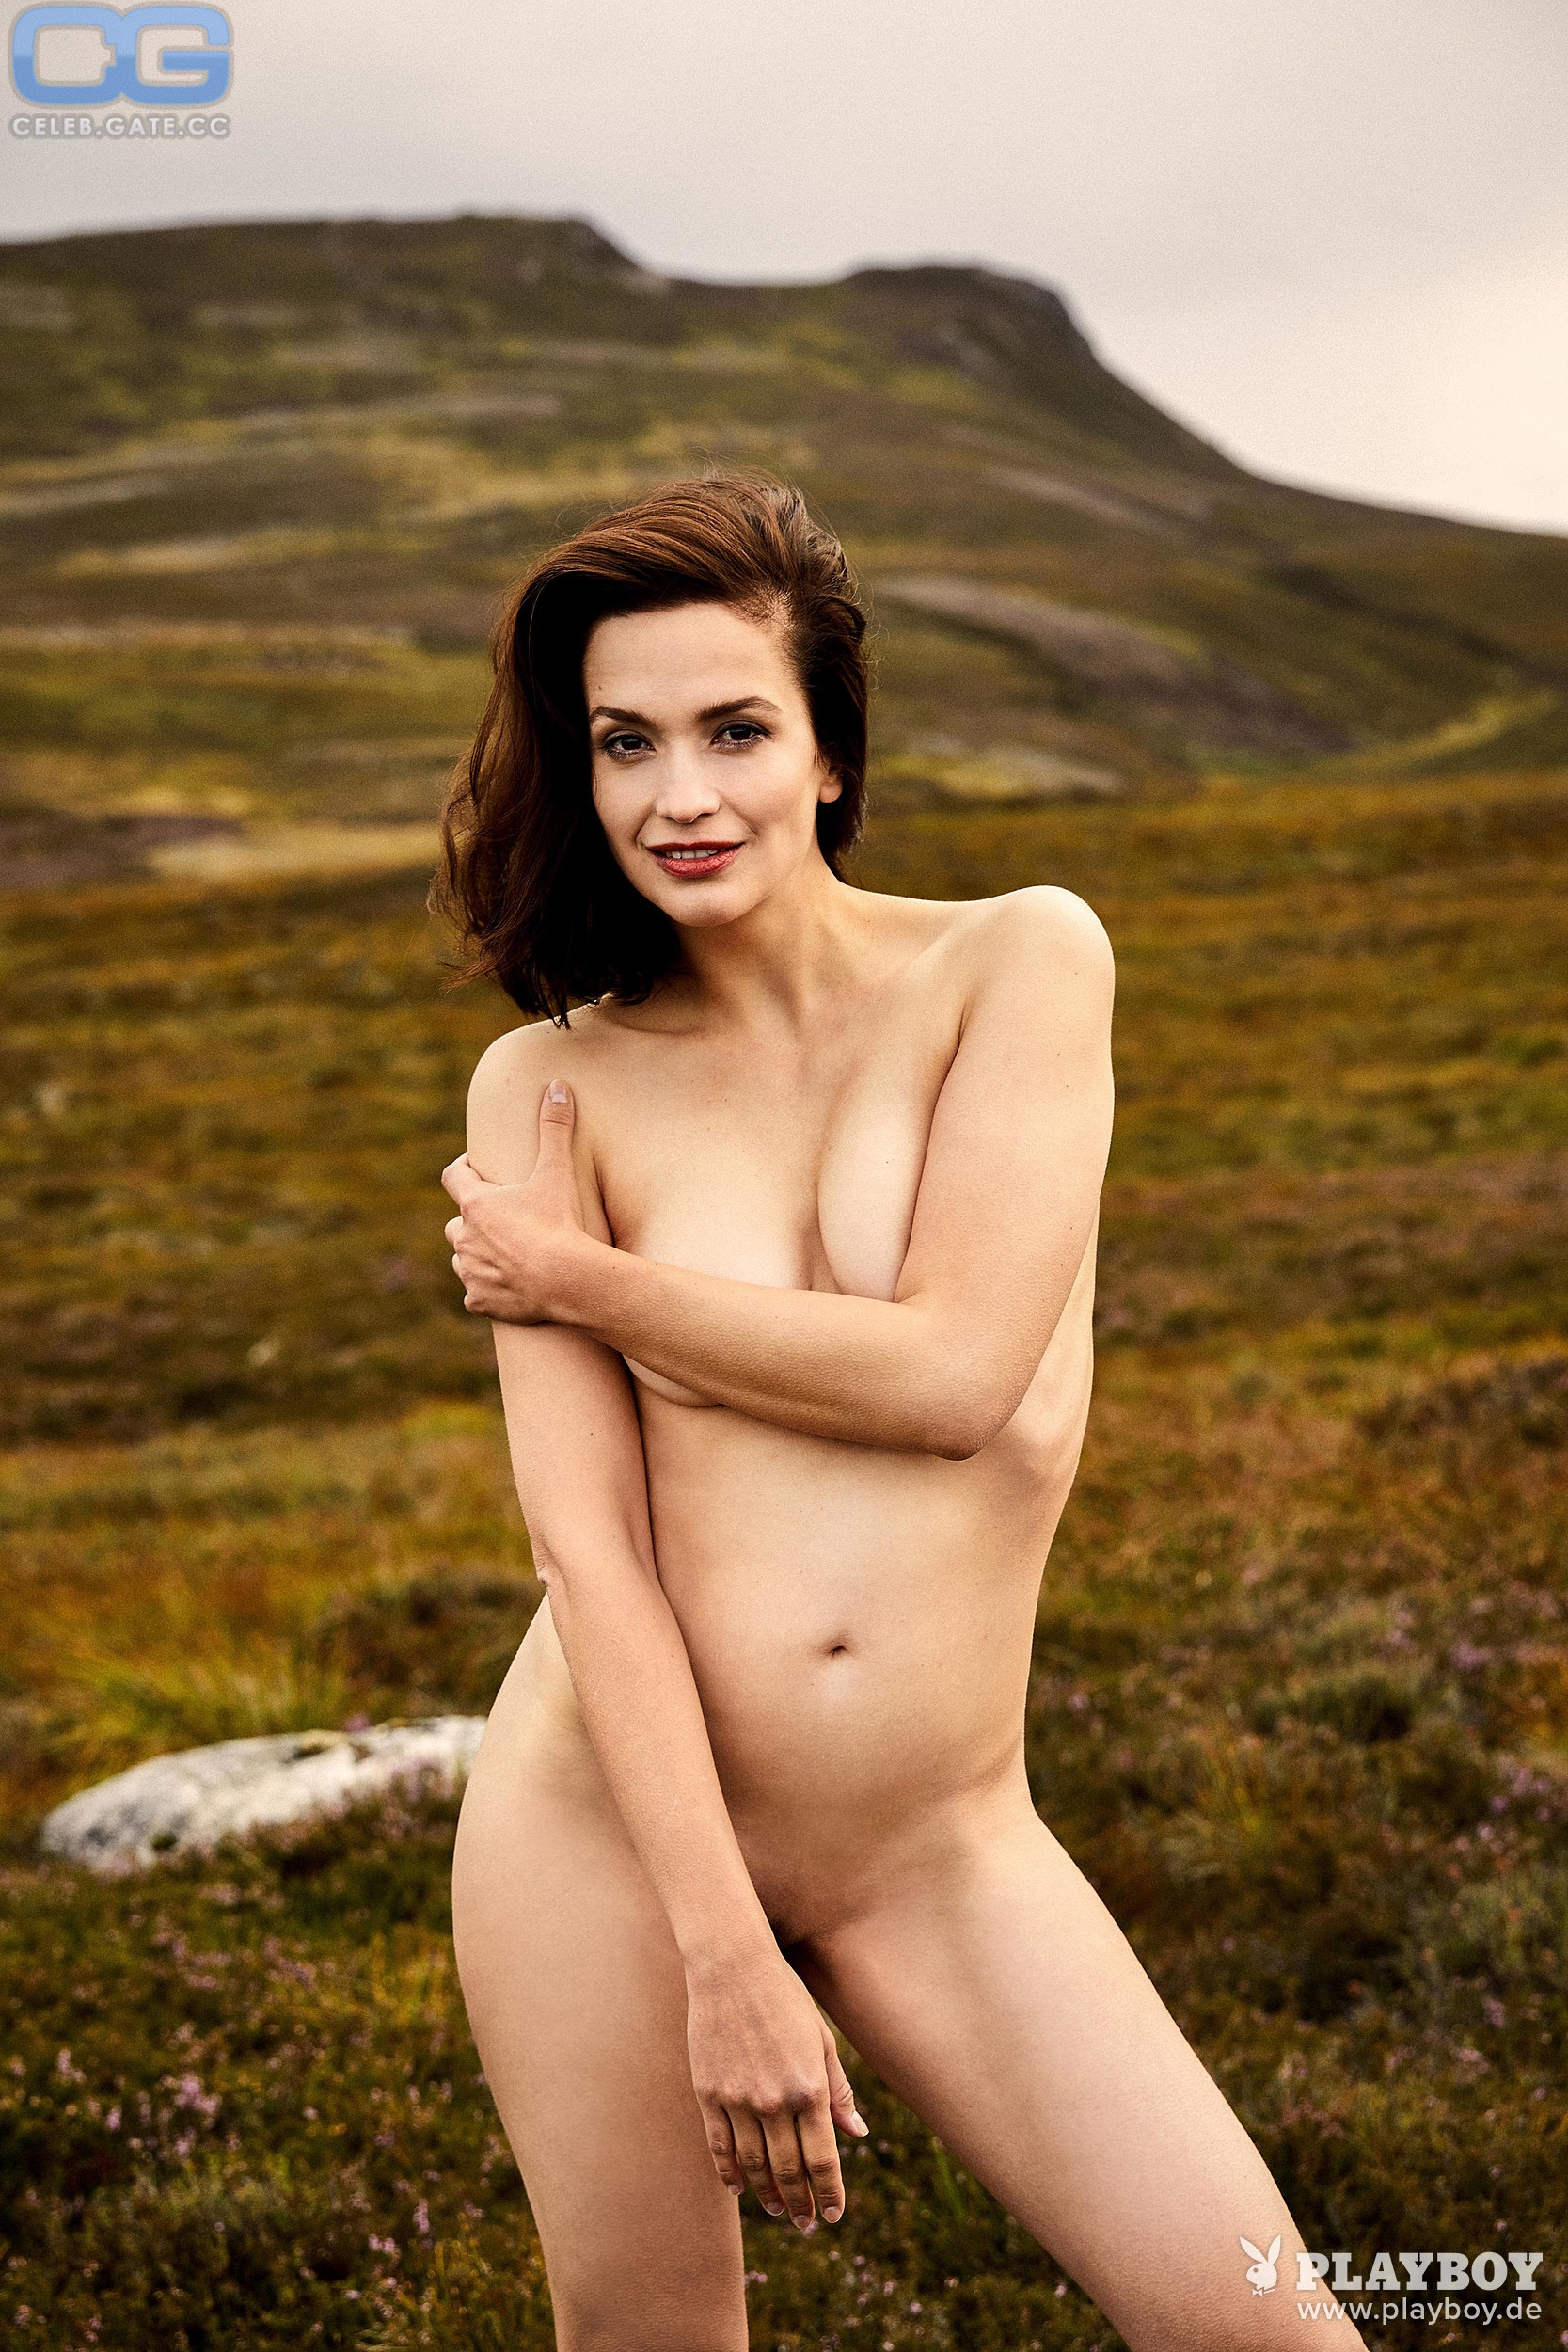 Nackt ulrike playboy frank Nudity in